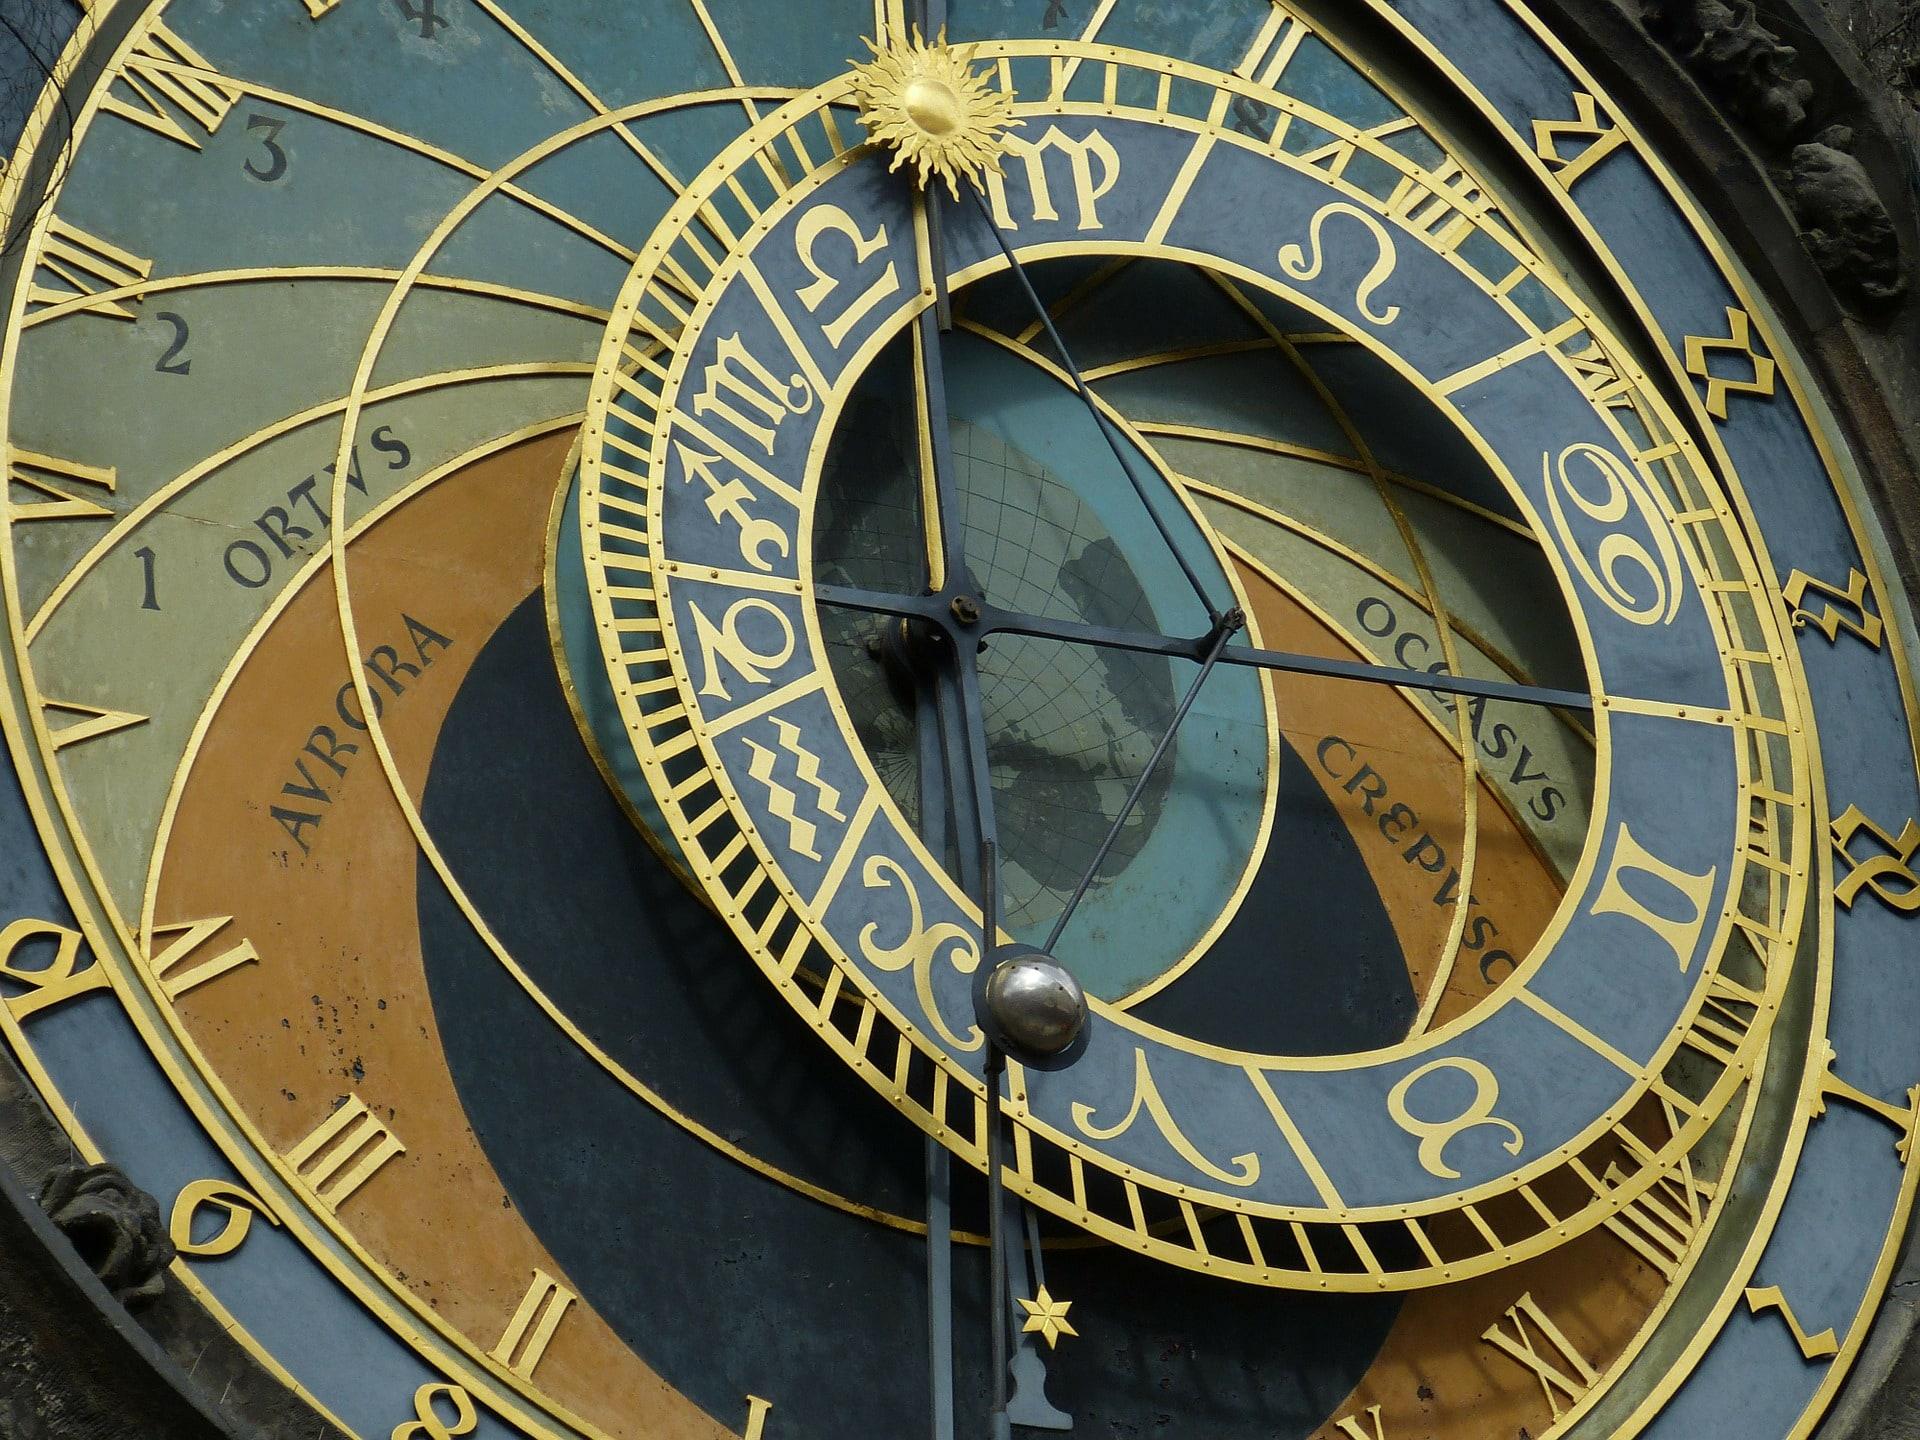 https://pixabay.com/en/astronomical-clock-prague-old-town-226897/